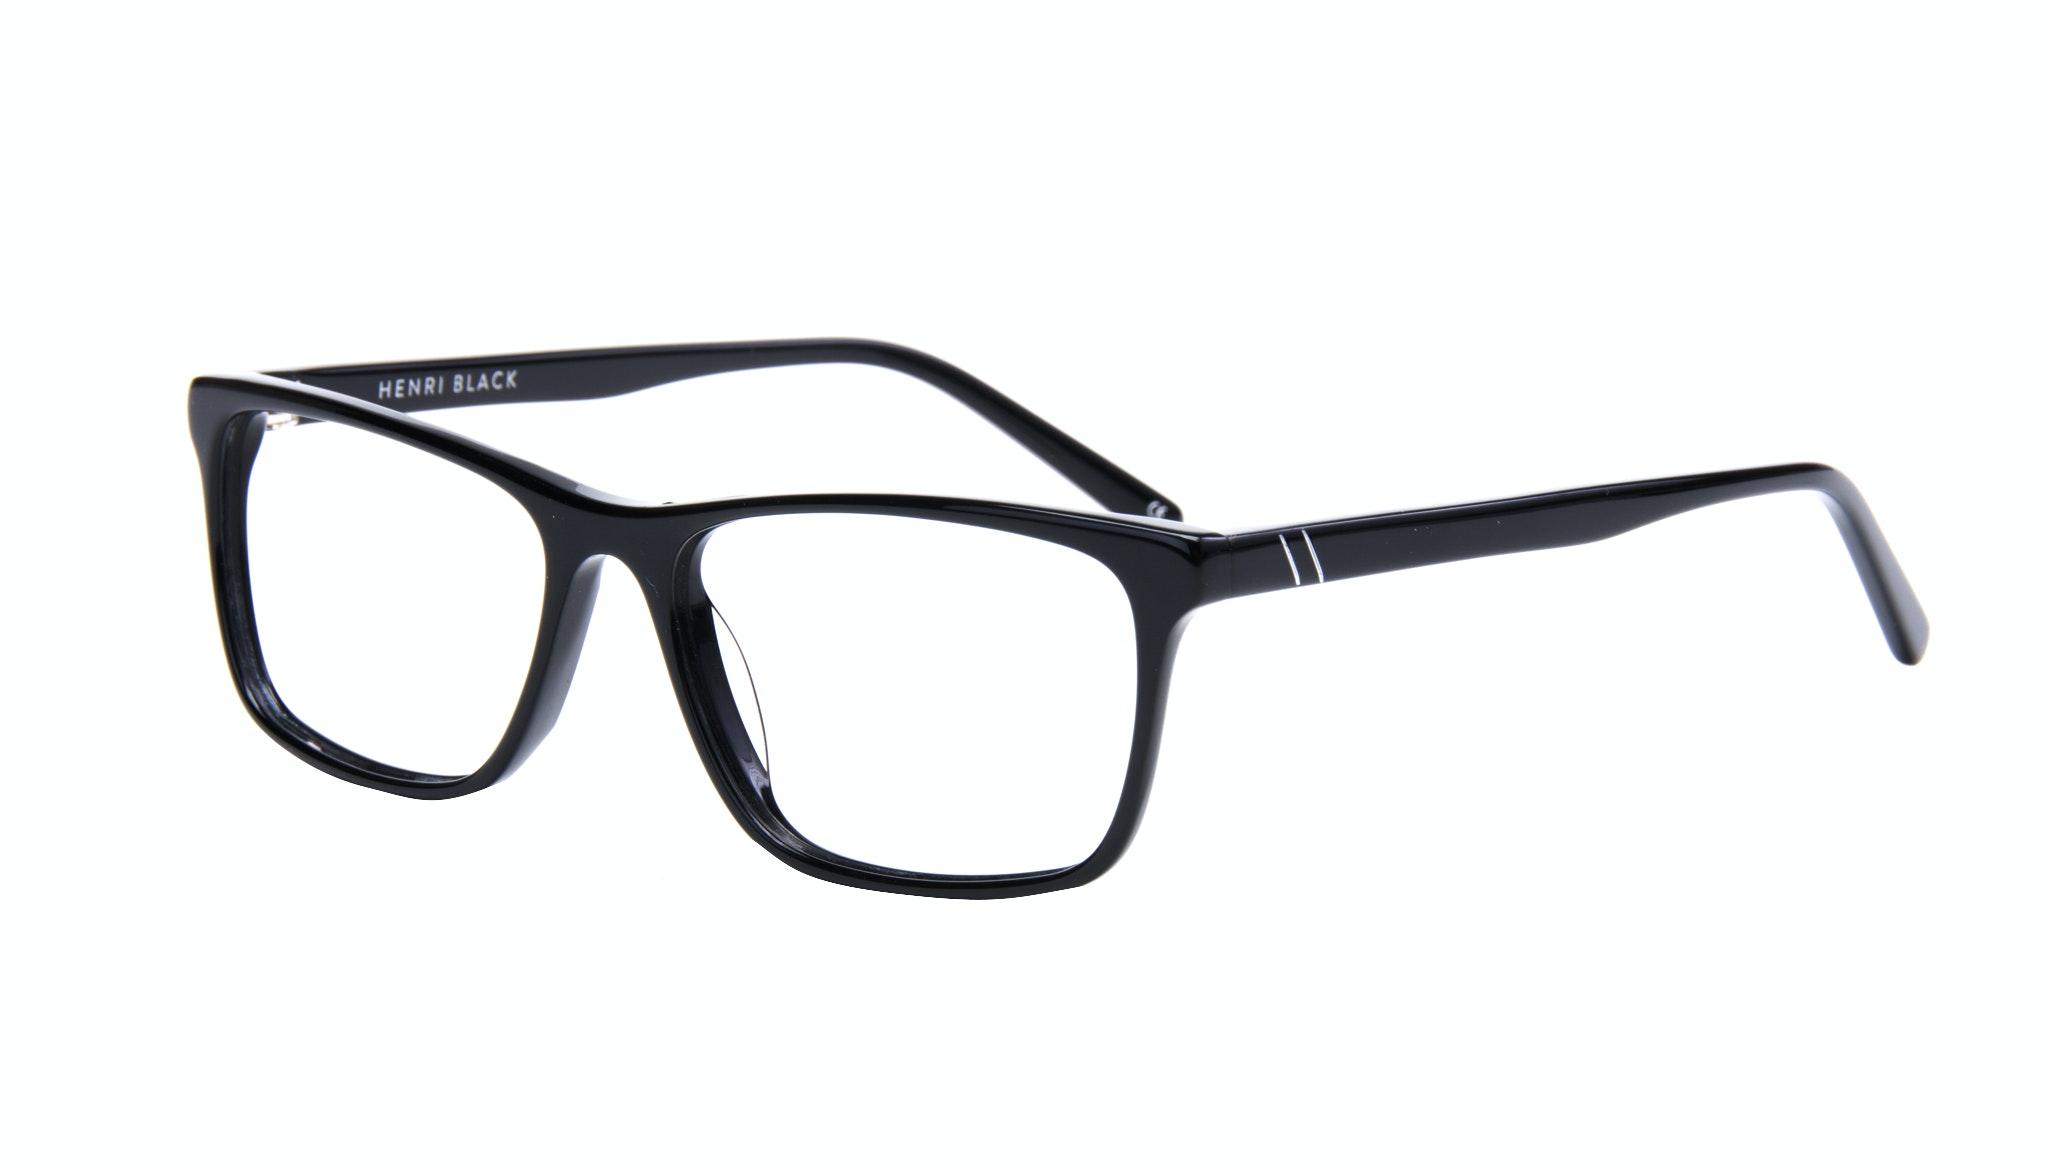 Affordable Fashion Glasses Rectangle Eyeglasses Men Henri Black  Tilt